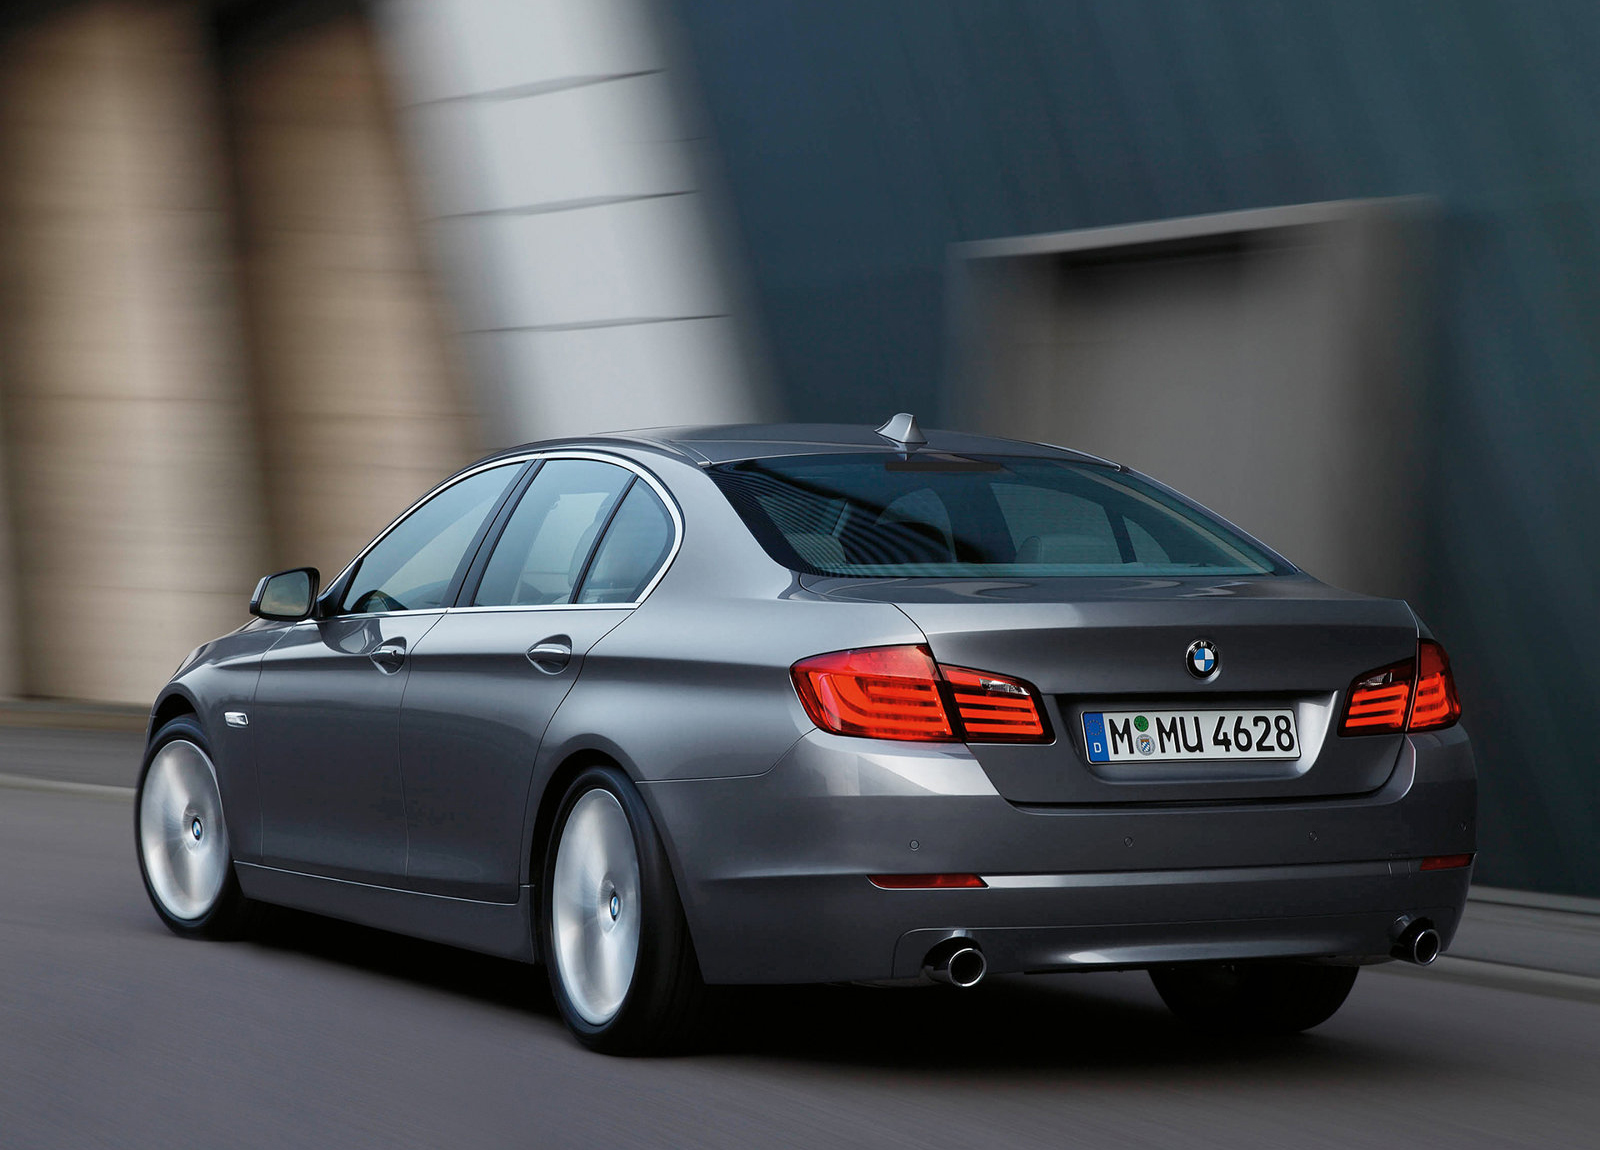 http://4.bp.blogspot.com/--iHl5o6ONLs/UE36JFCc24I/AAAAAAAAHSc/AjtoDT3LPac/s1600/BMW-5-Series_2011_1600x1200_wallpaper_61.jpg